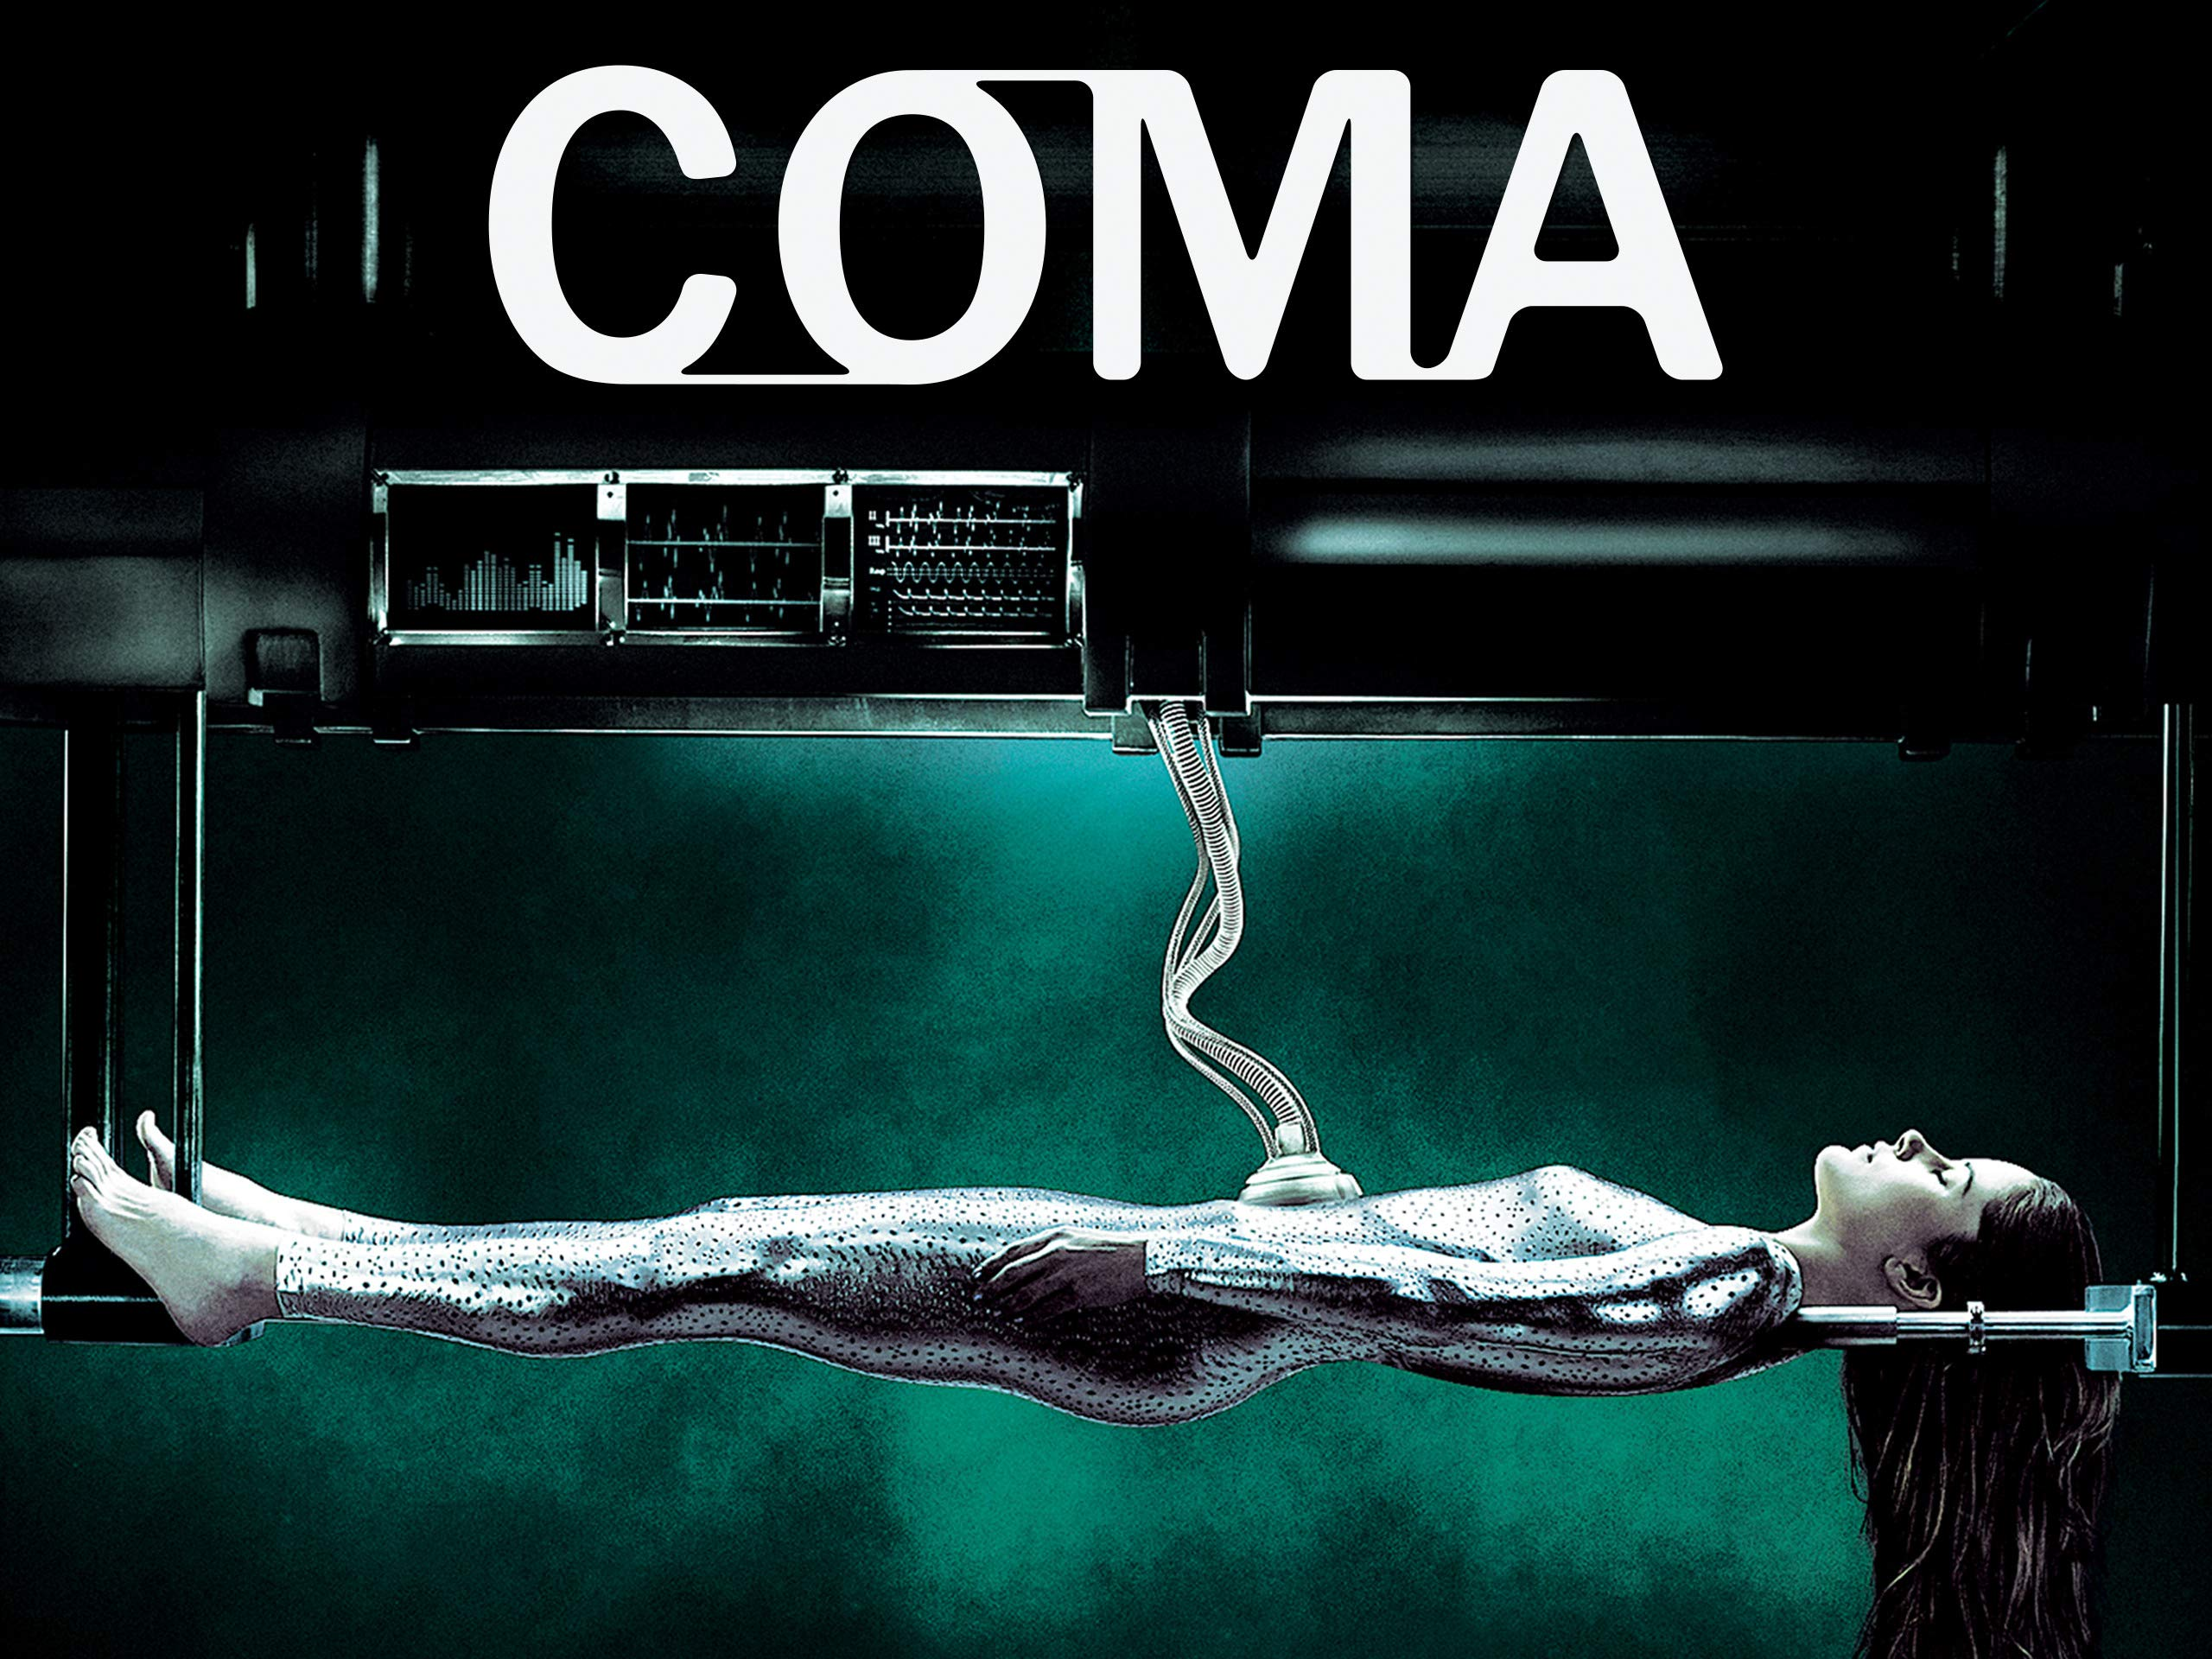 Coma - Season 1